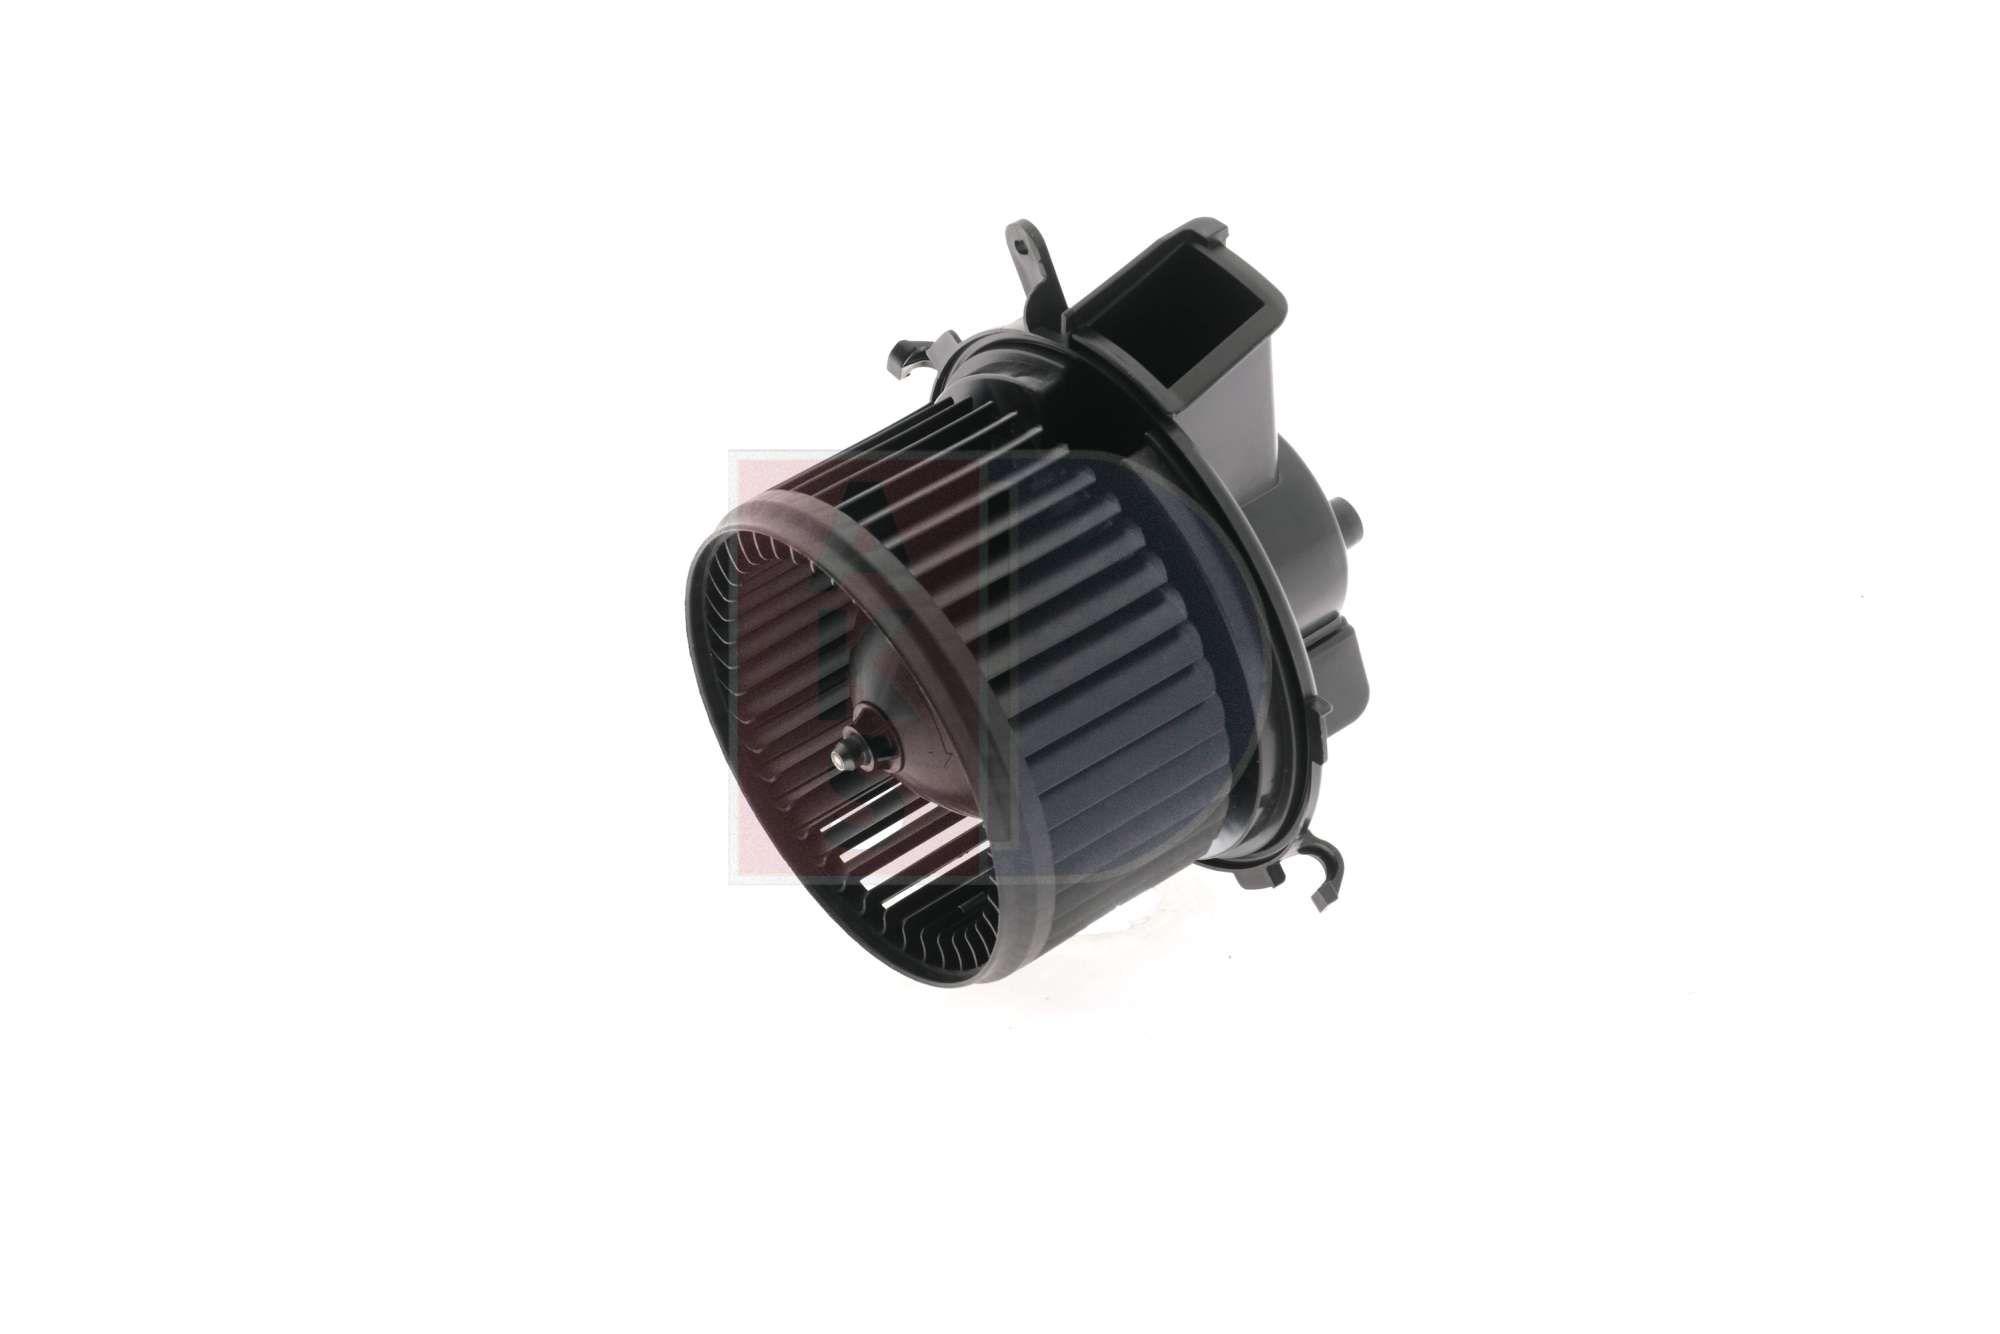 AKS DASIS  068096N Innenraumgebläse Spannung: 12V, Nennleistung: 320W